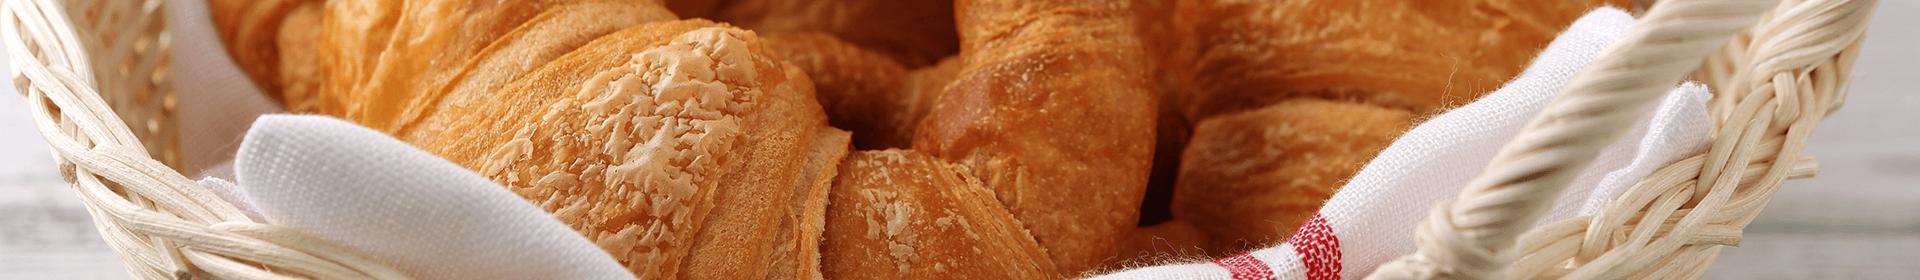 artykuly-kuchenne